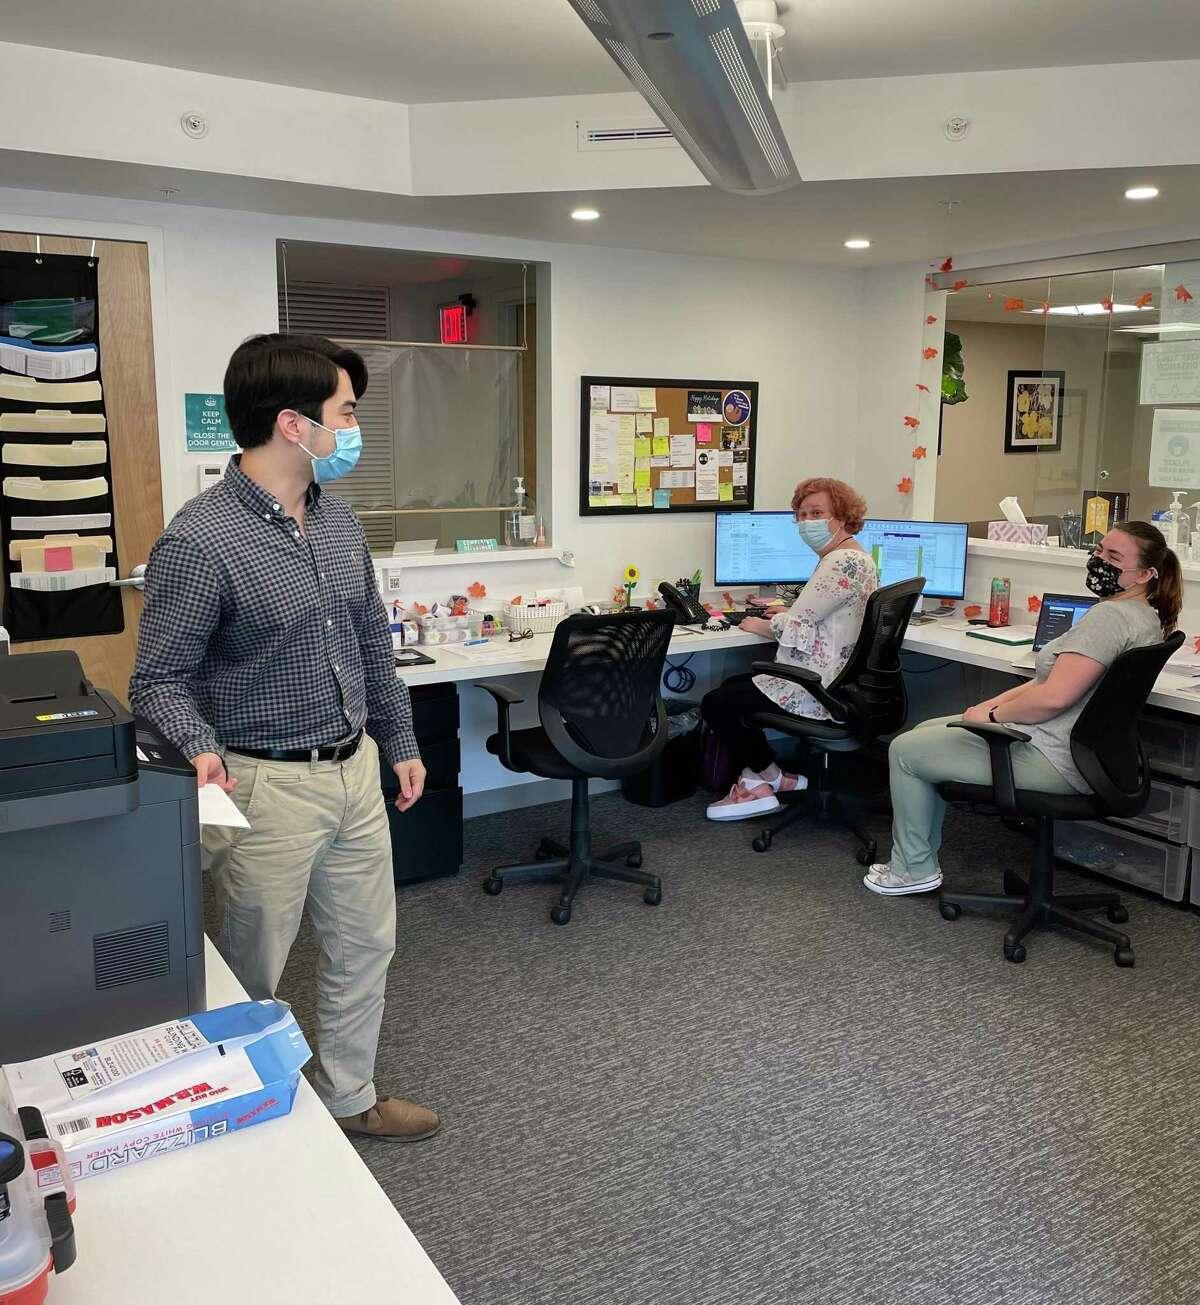 At Autism Behavioral Health in Danbury, Nicholas Rosenhaus, HR specialist, talks with Linda Solimine, administrative assistant, and Aleena Sirota, a registered behavior technician.